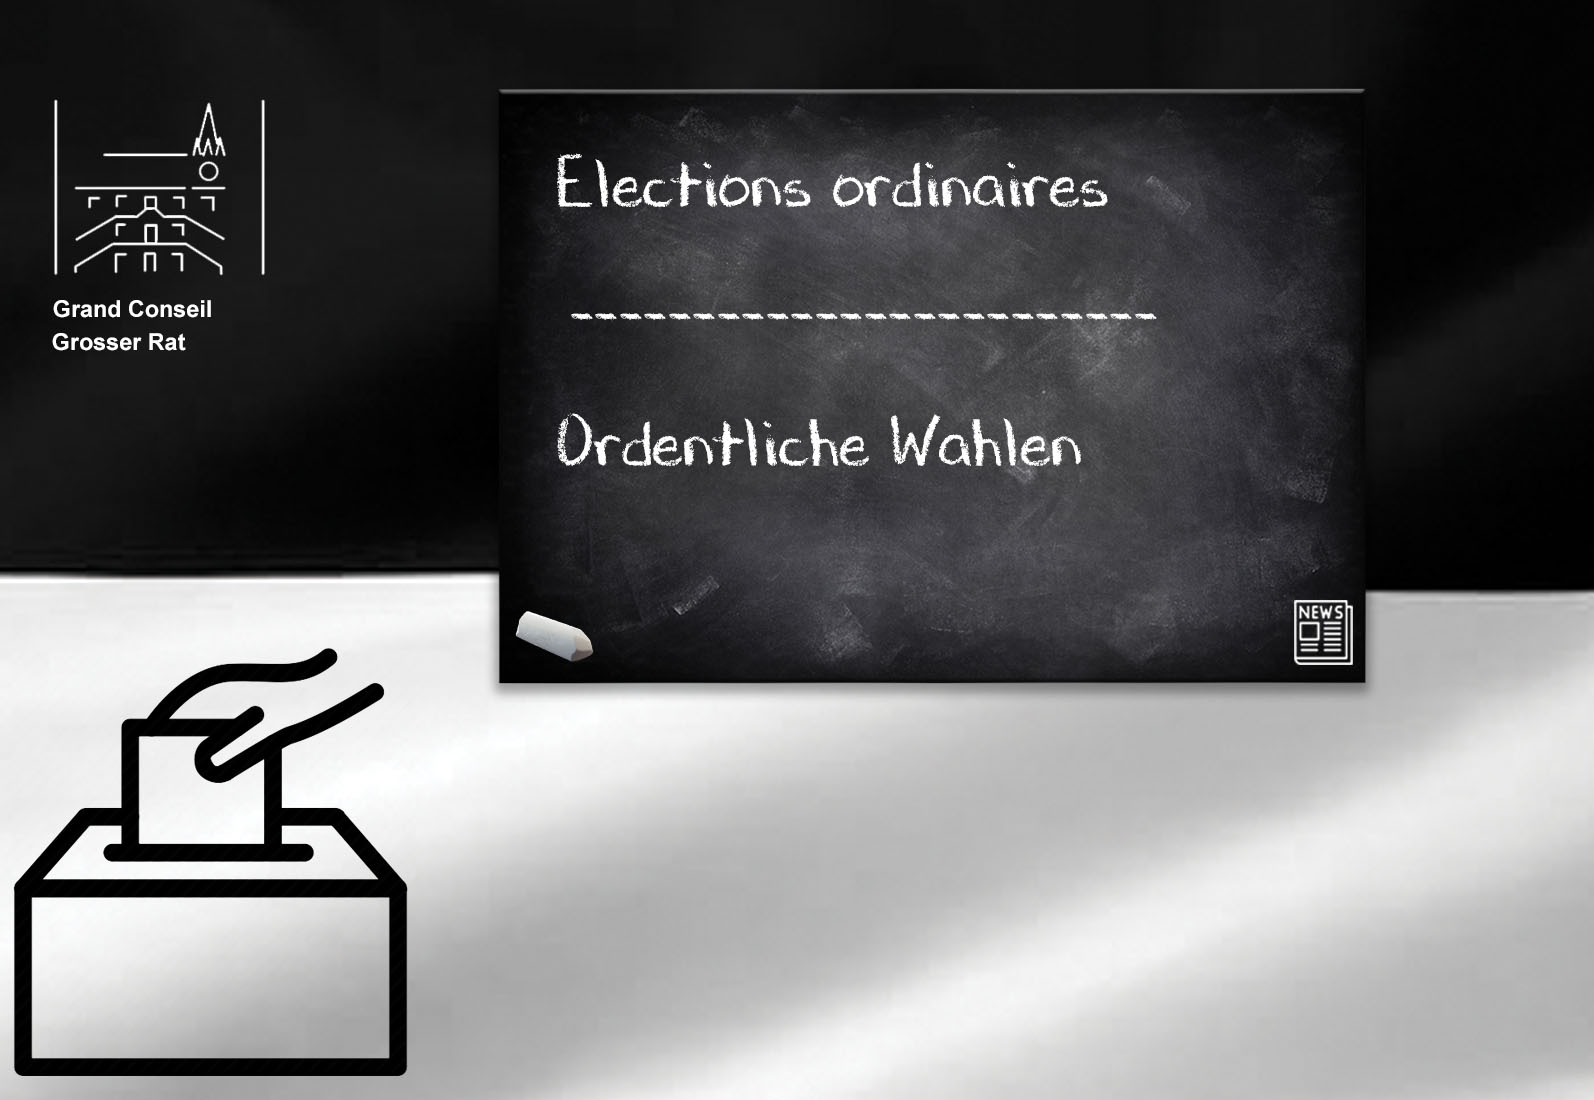 Elections Ordinaires   Ordentliche Wahlen